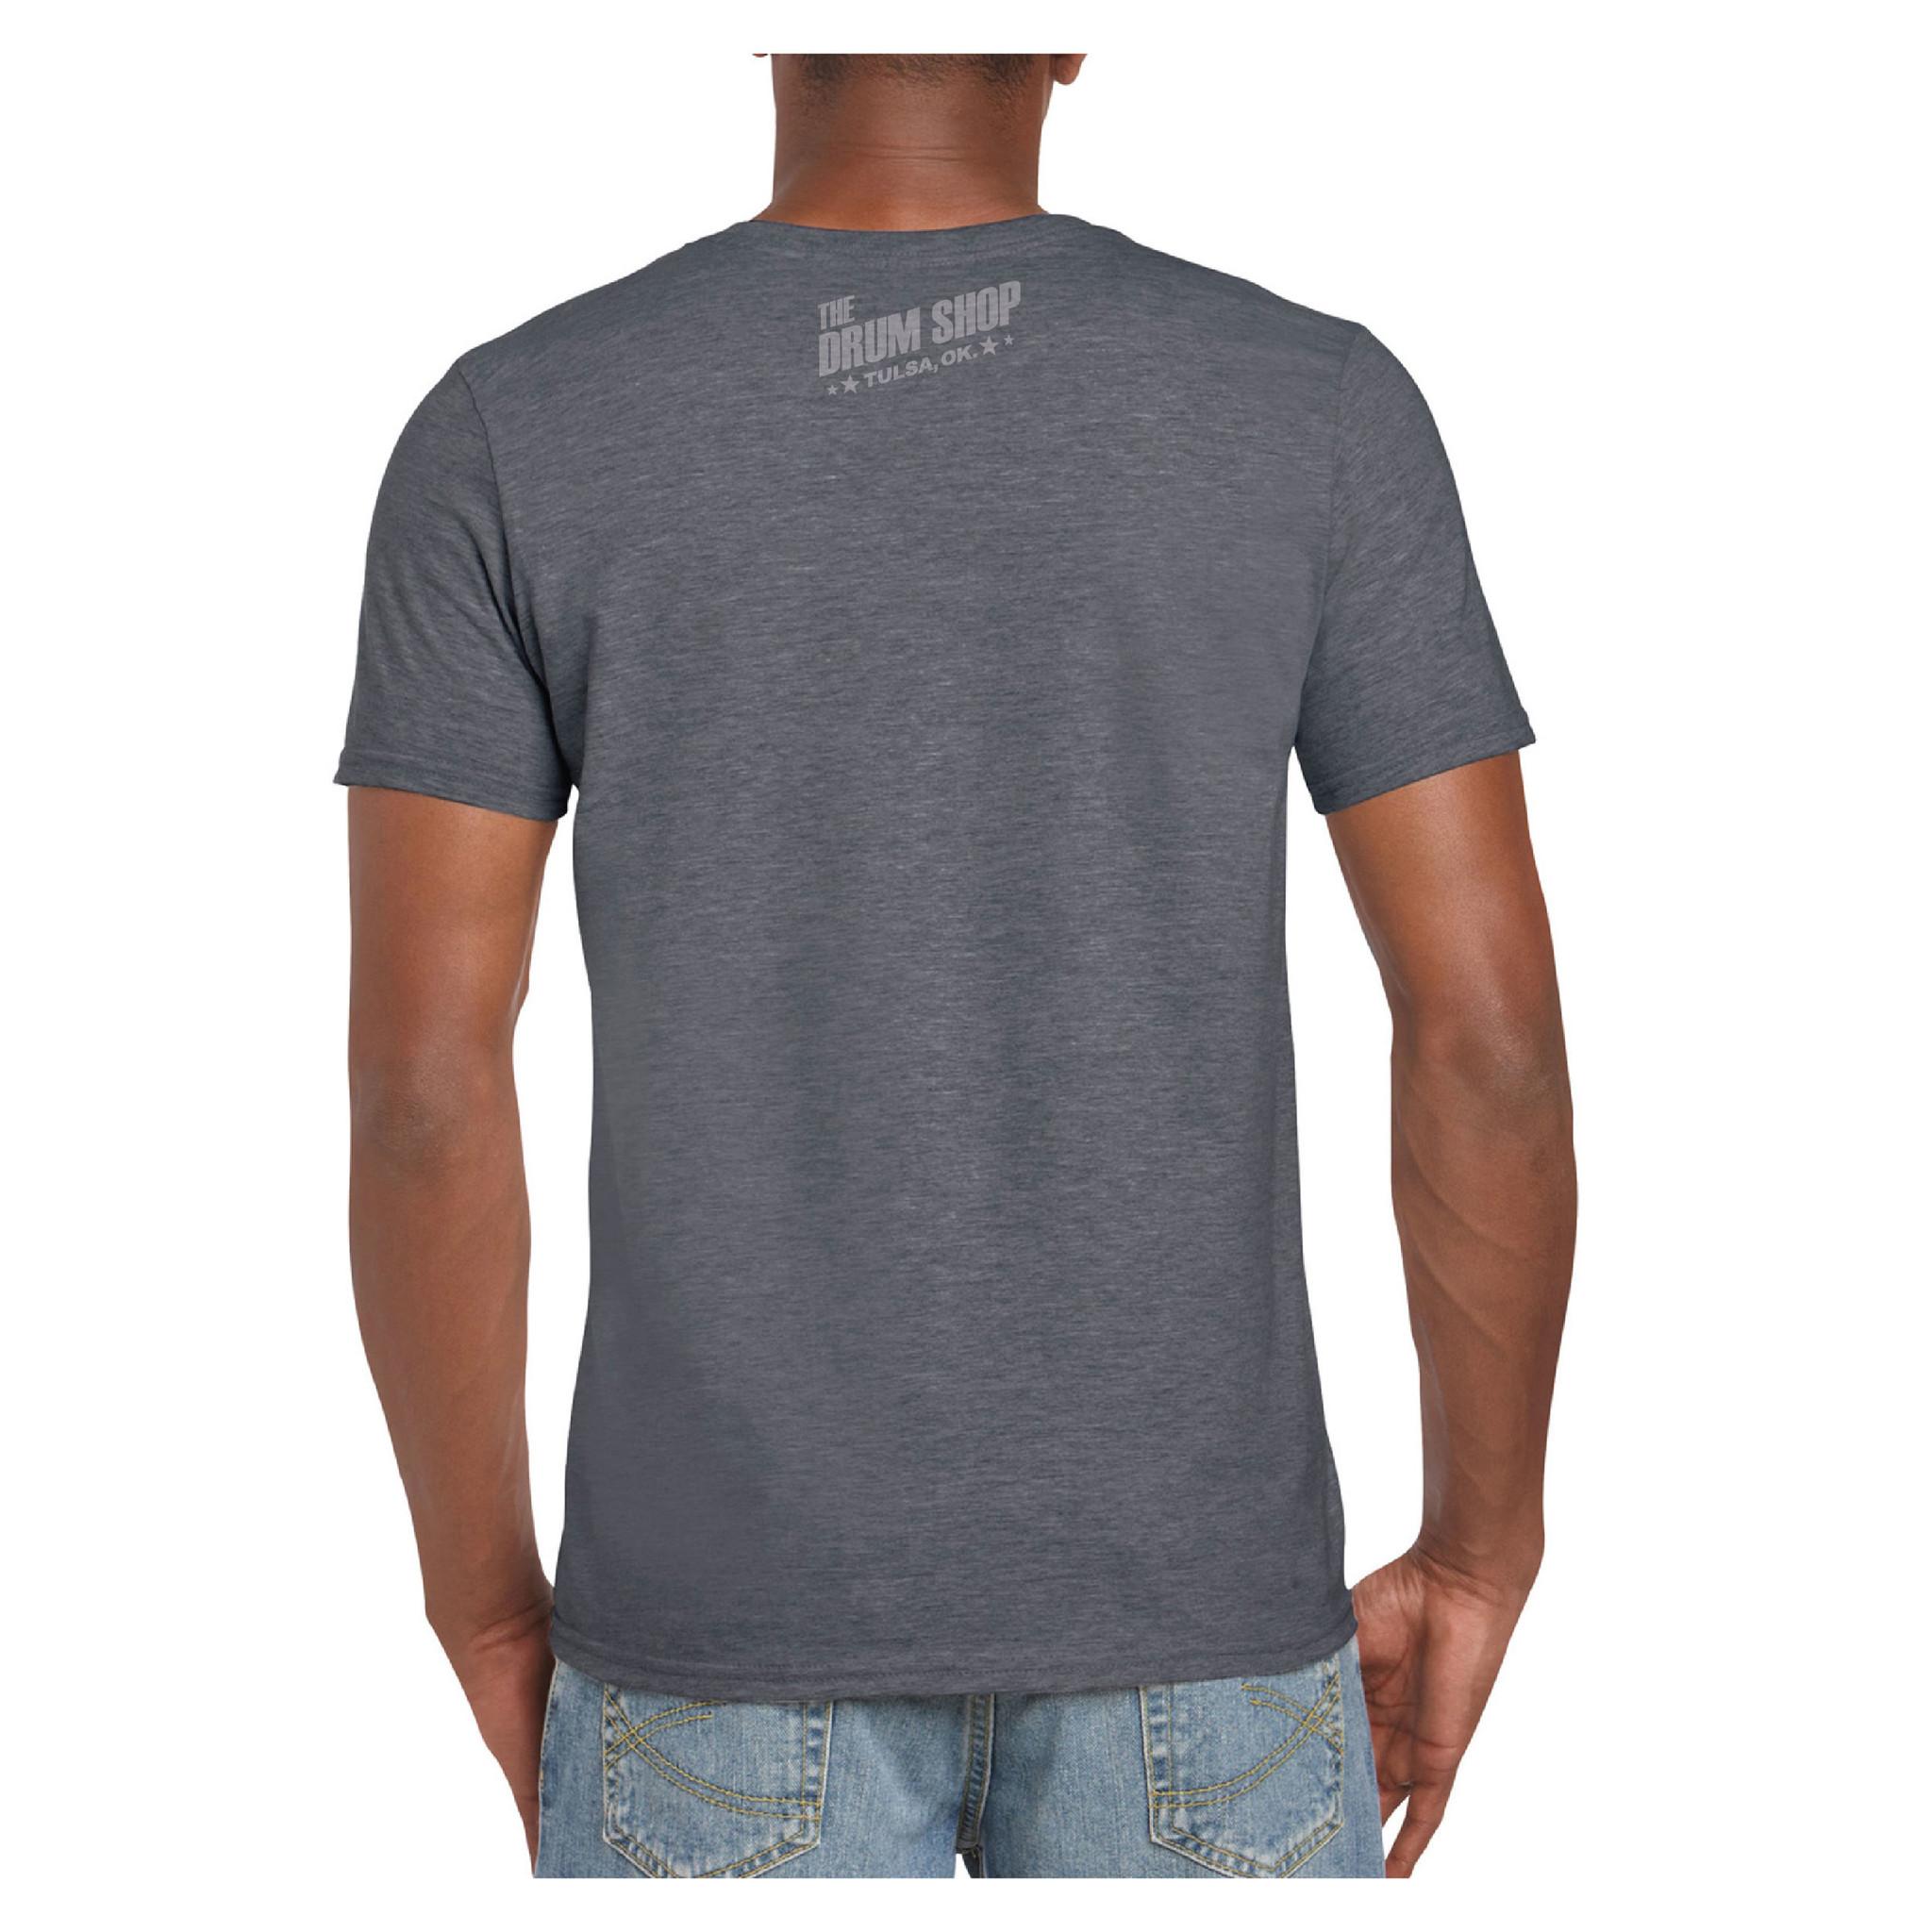 "The Drum Shop The Drum Shop ""Limited"" T-Shirt - Sleep Eat Drum - Grey"